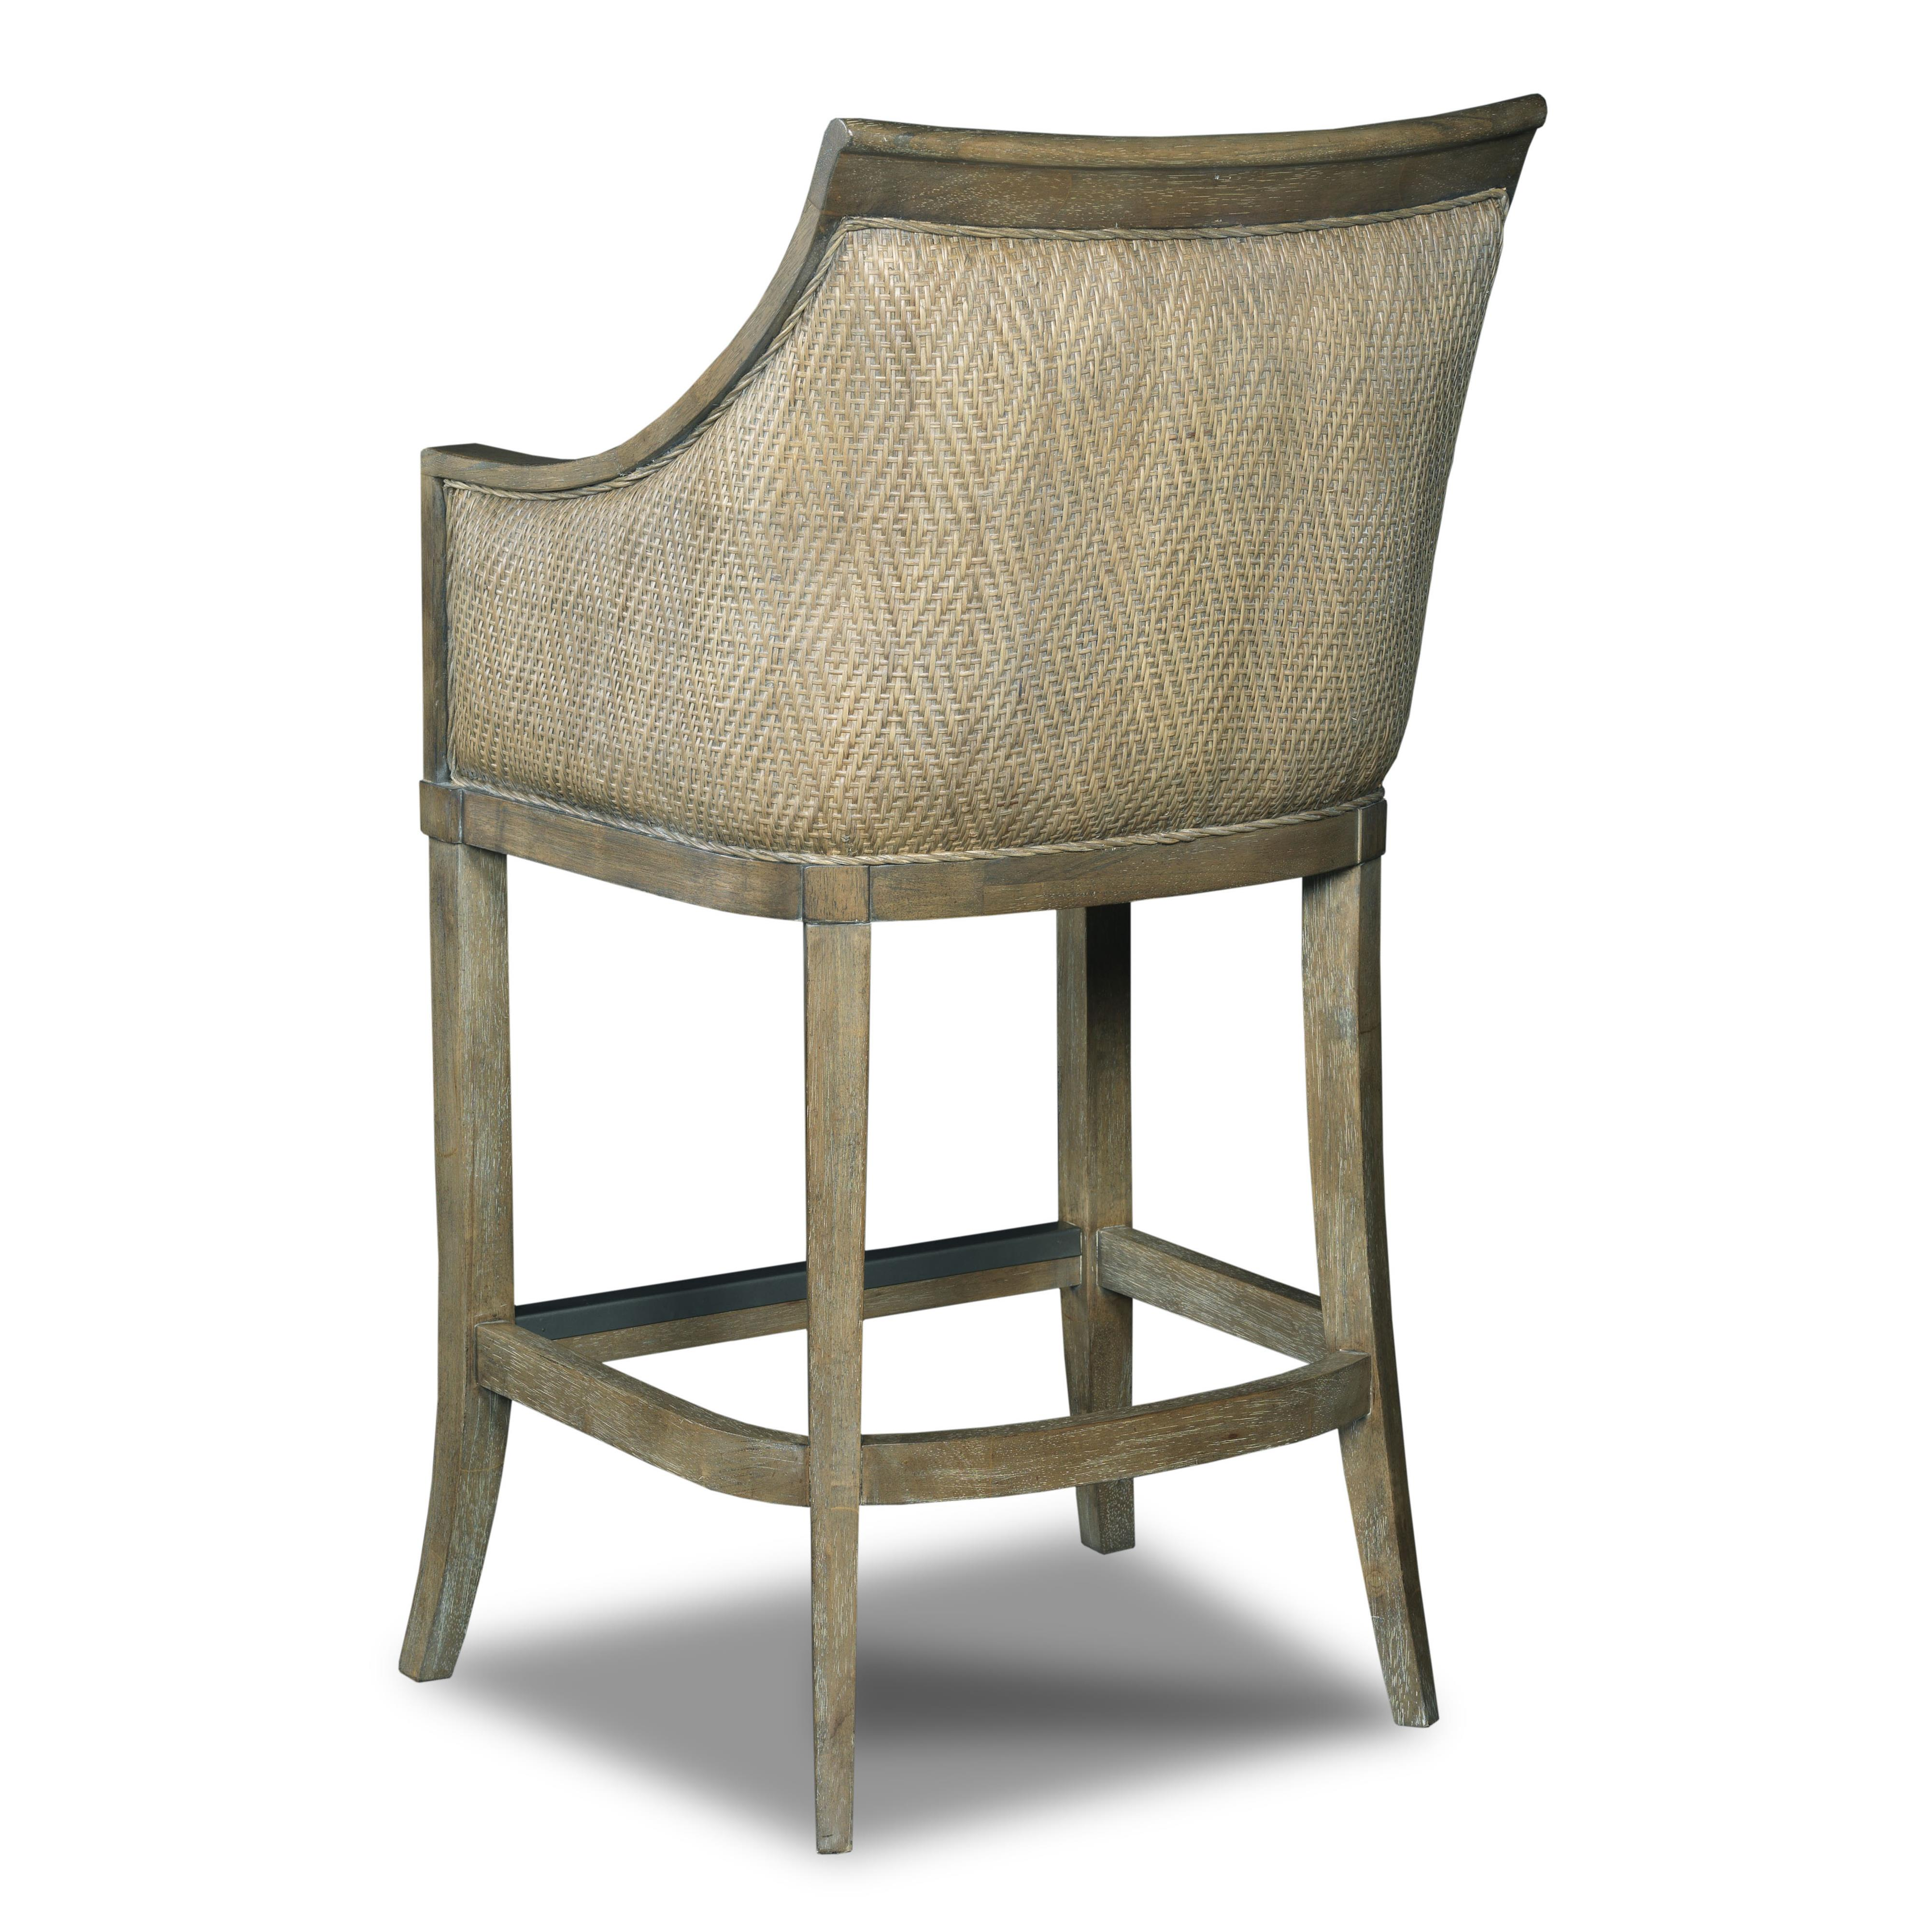 Hooker Furniture Stools Light Sea Breeze Tropical Barstool Olinde 39 S Furniture Bar Stools